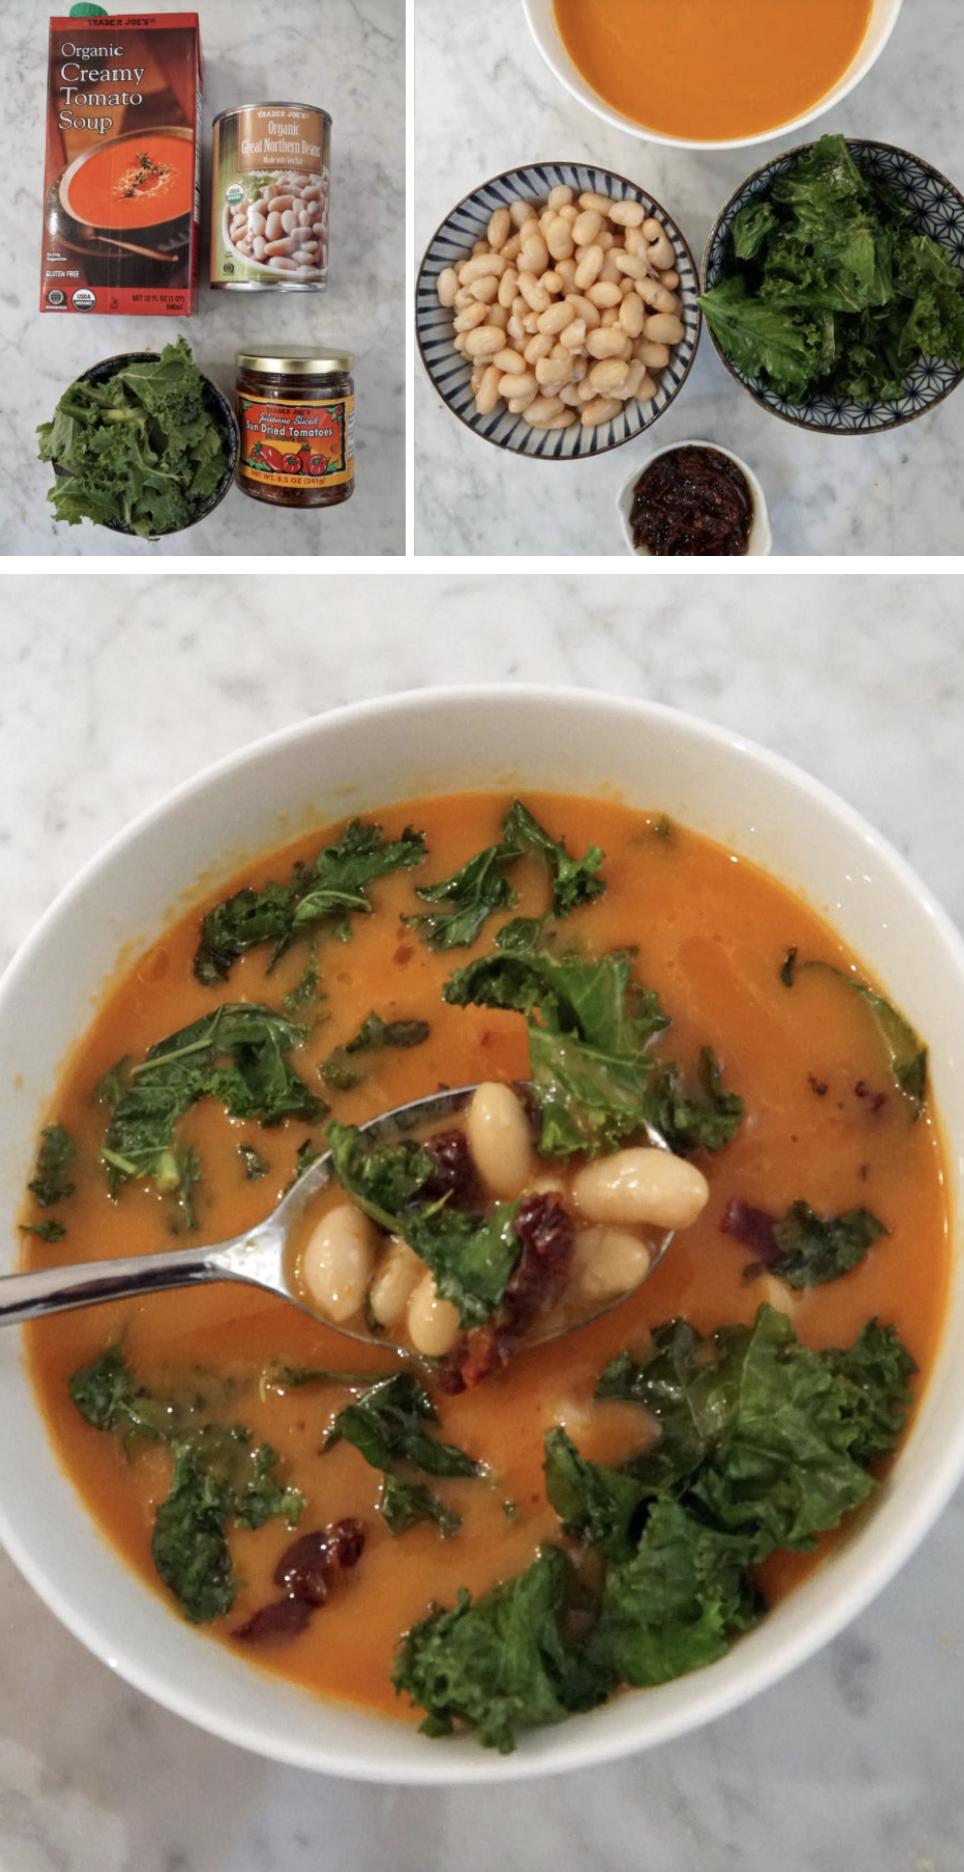 https://www.buzzfeed.com/hannahloewentheil/easy-trader-joes-three-ingredient-meals